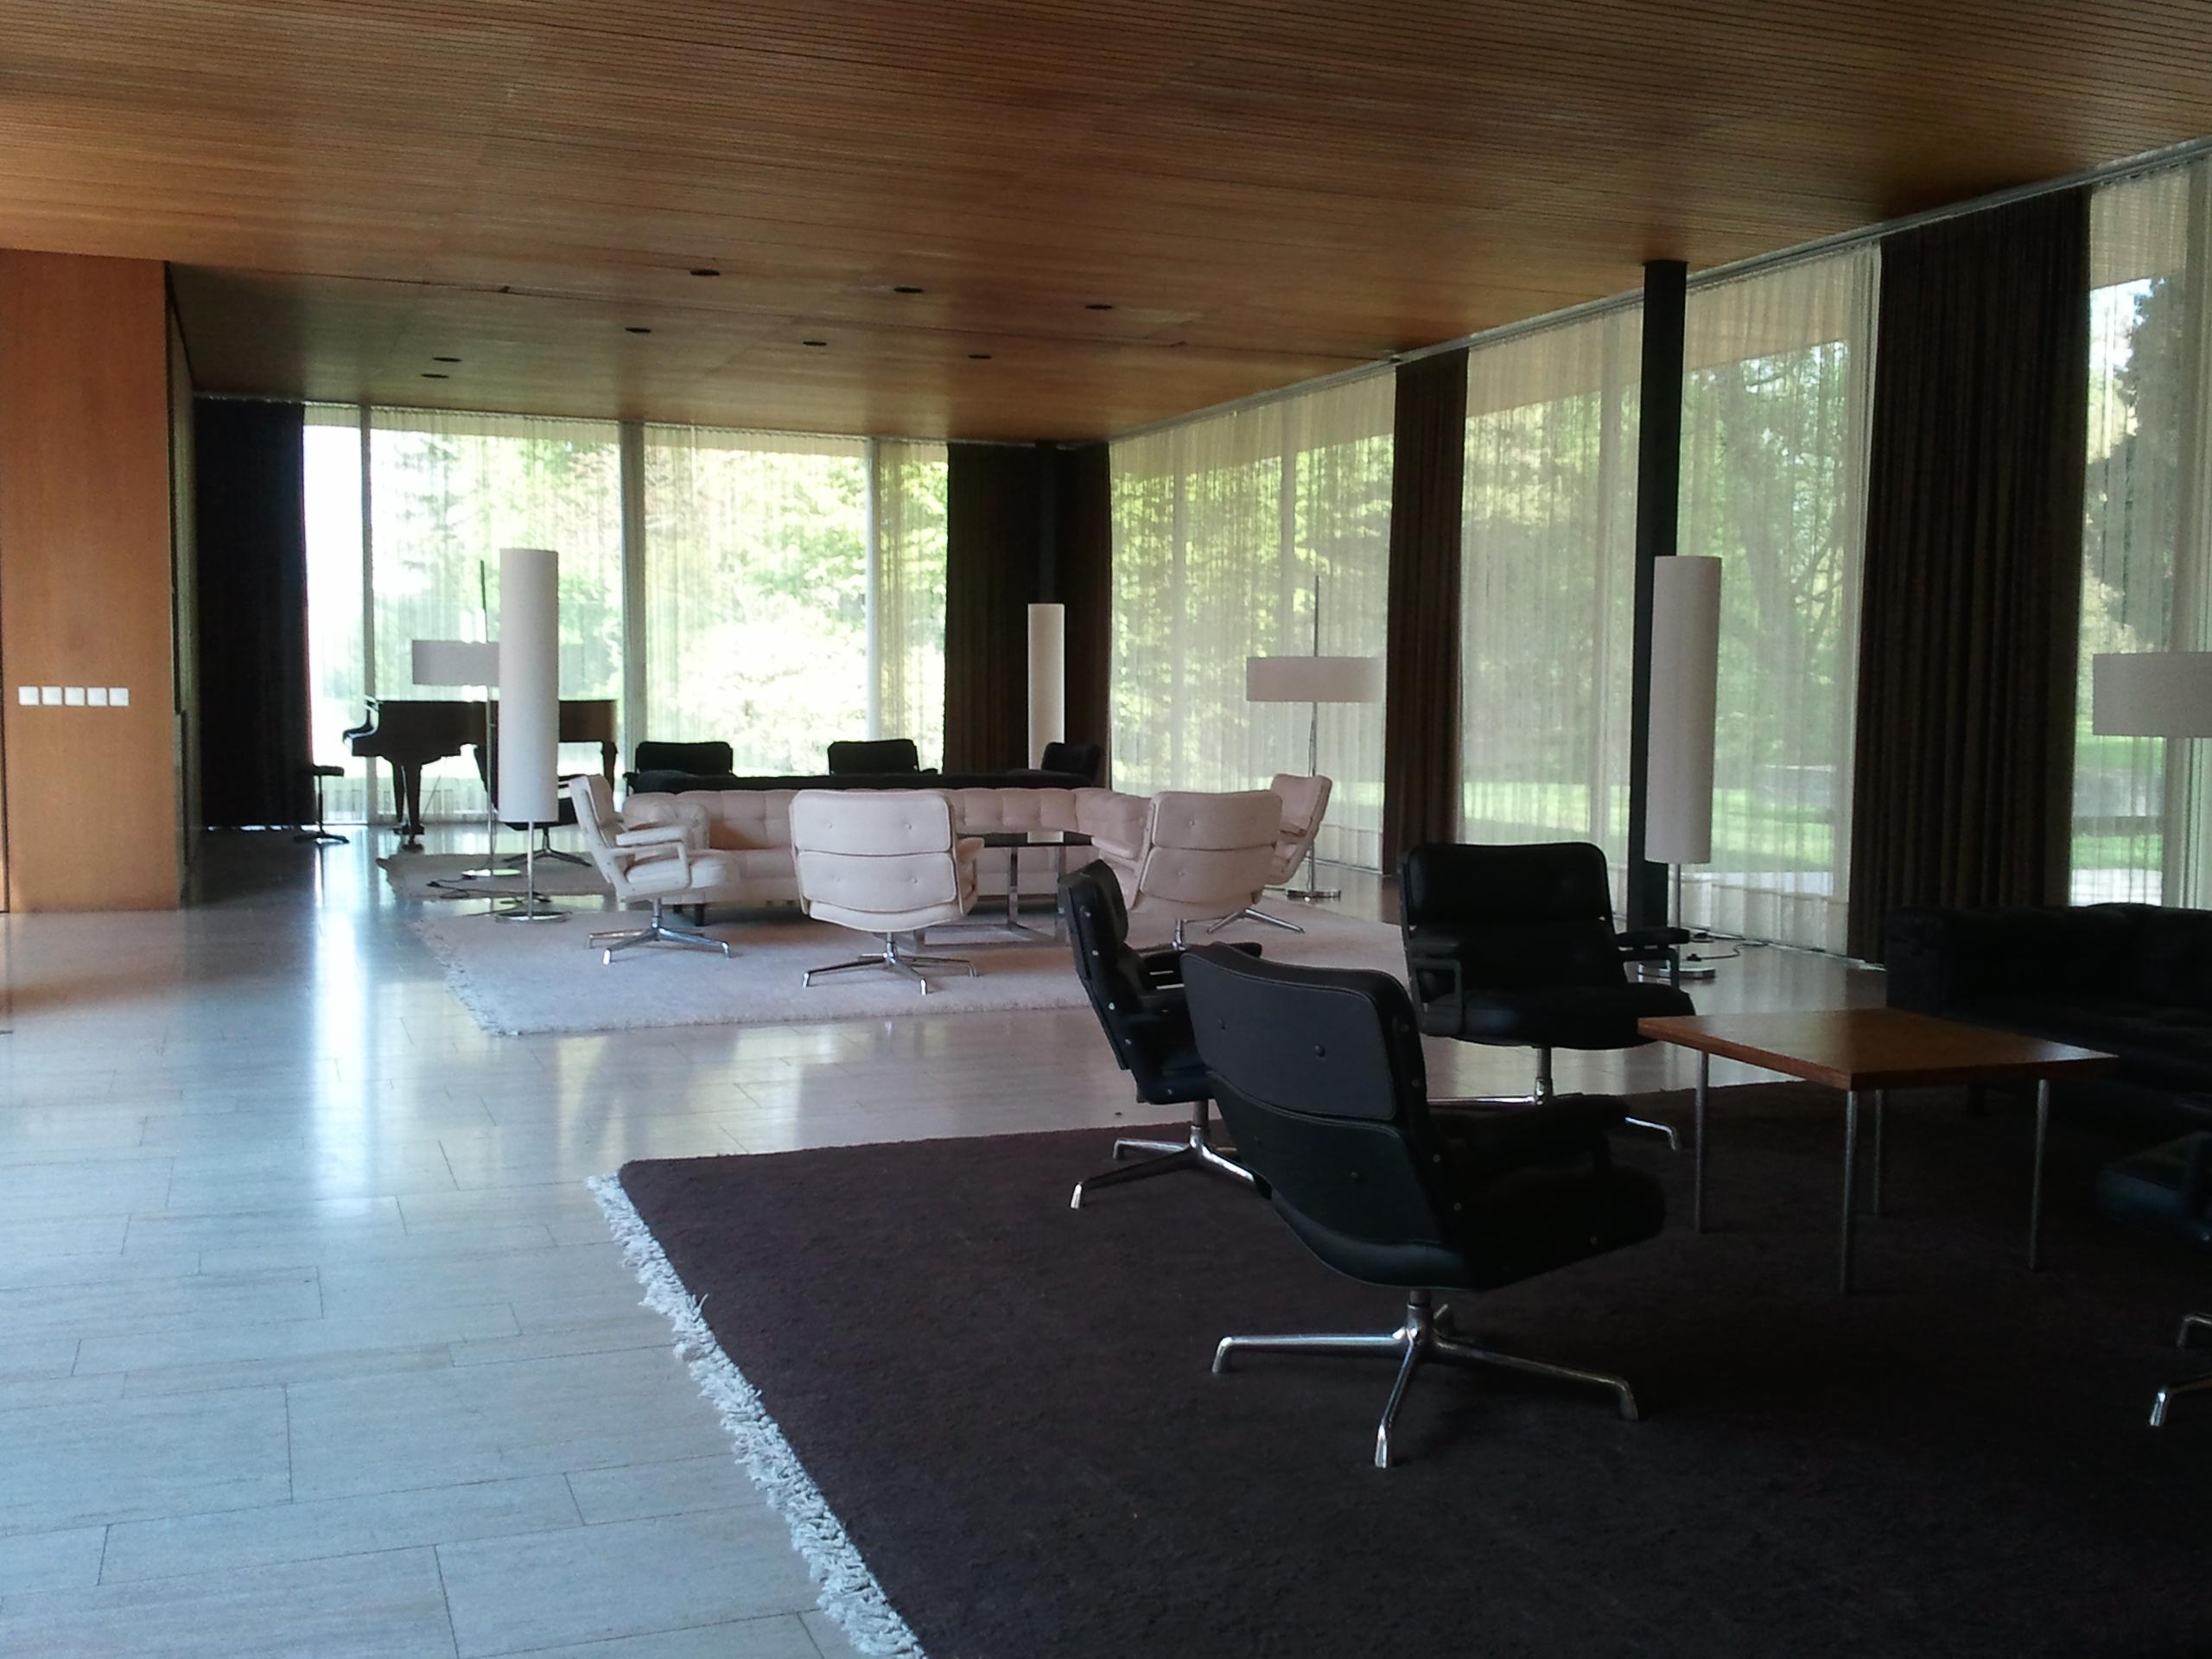 kanzlerbungalow bonn architektur baukunst nrw. Black Bedroom Furniture Sets. Home Design Ideas